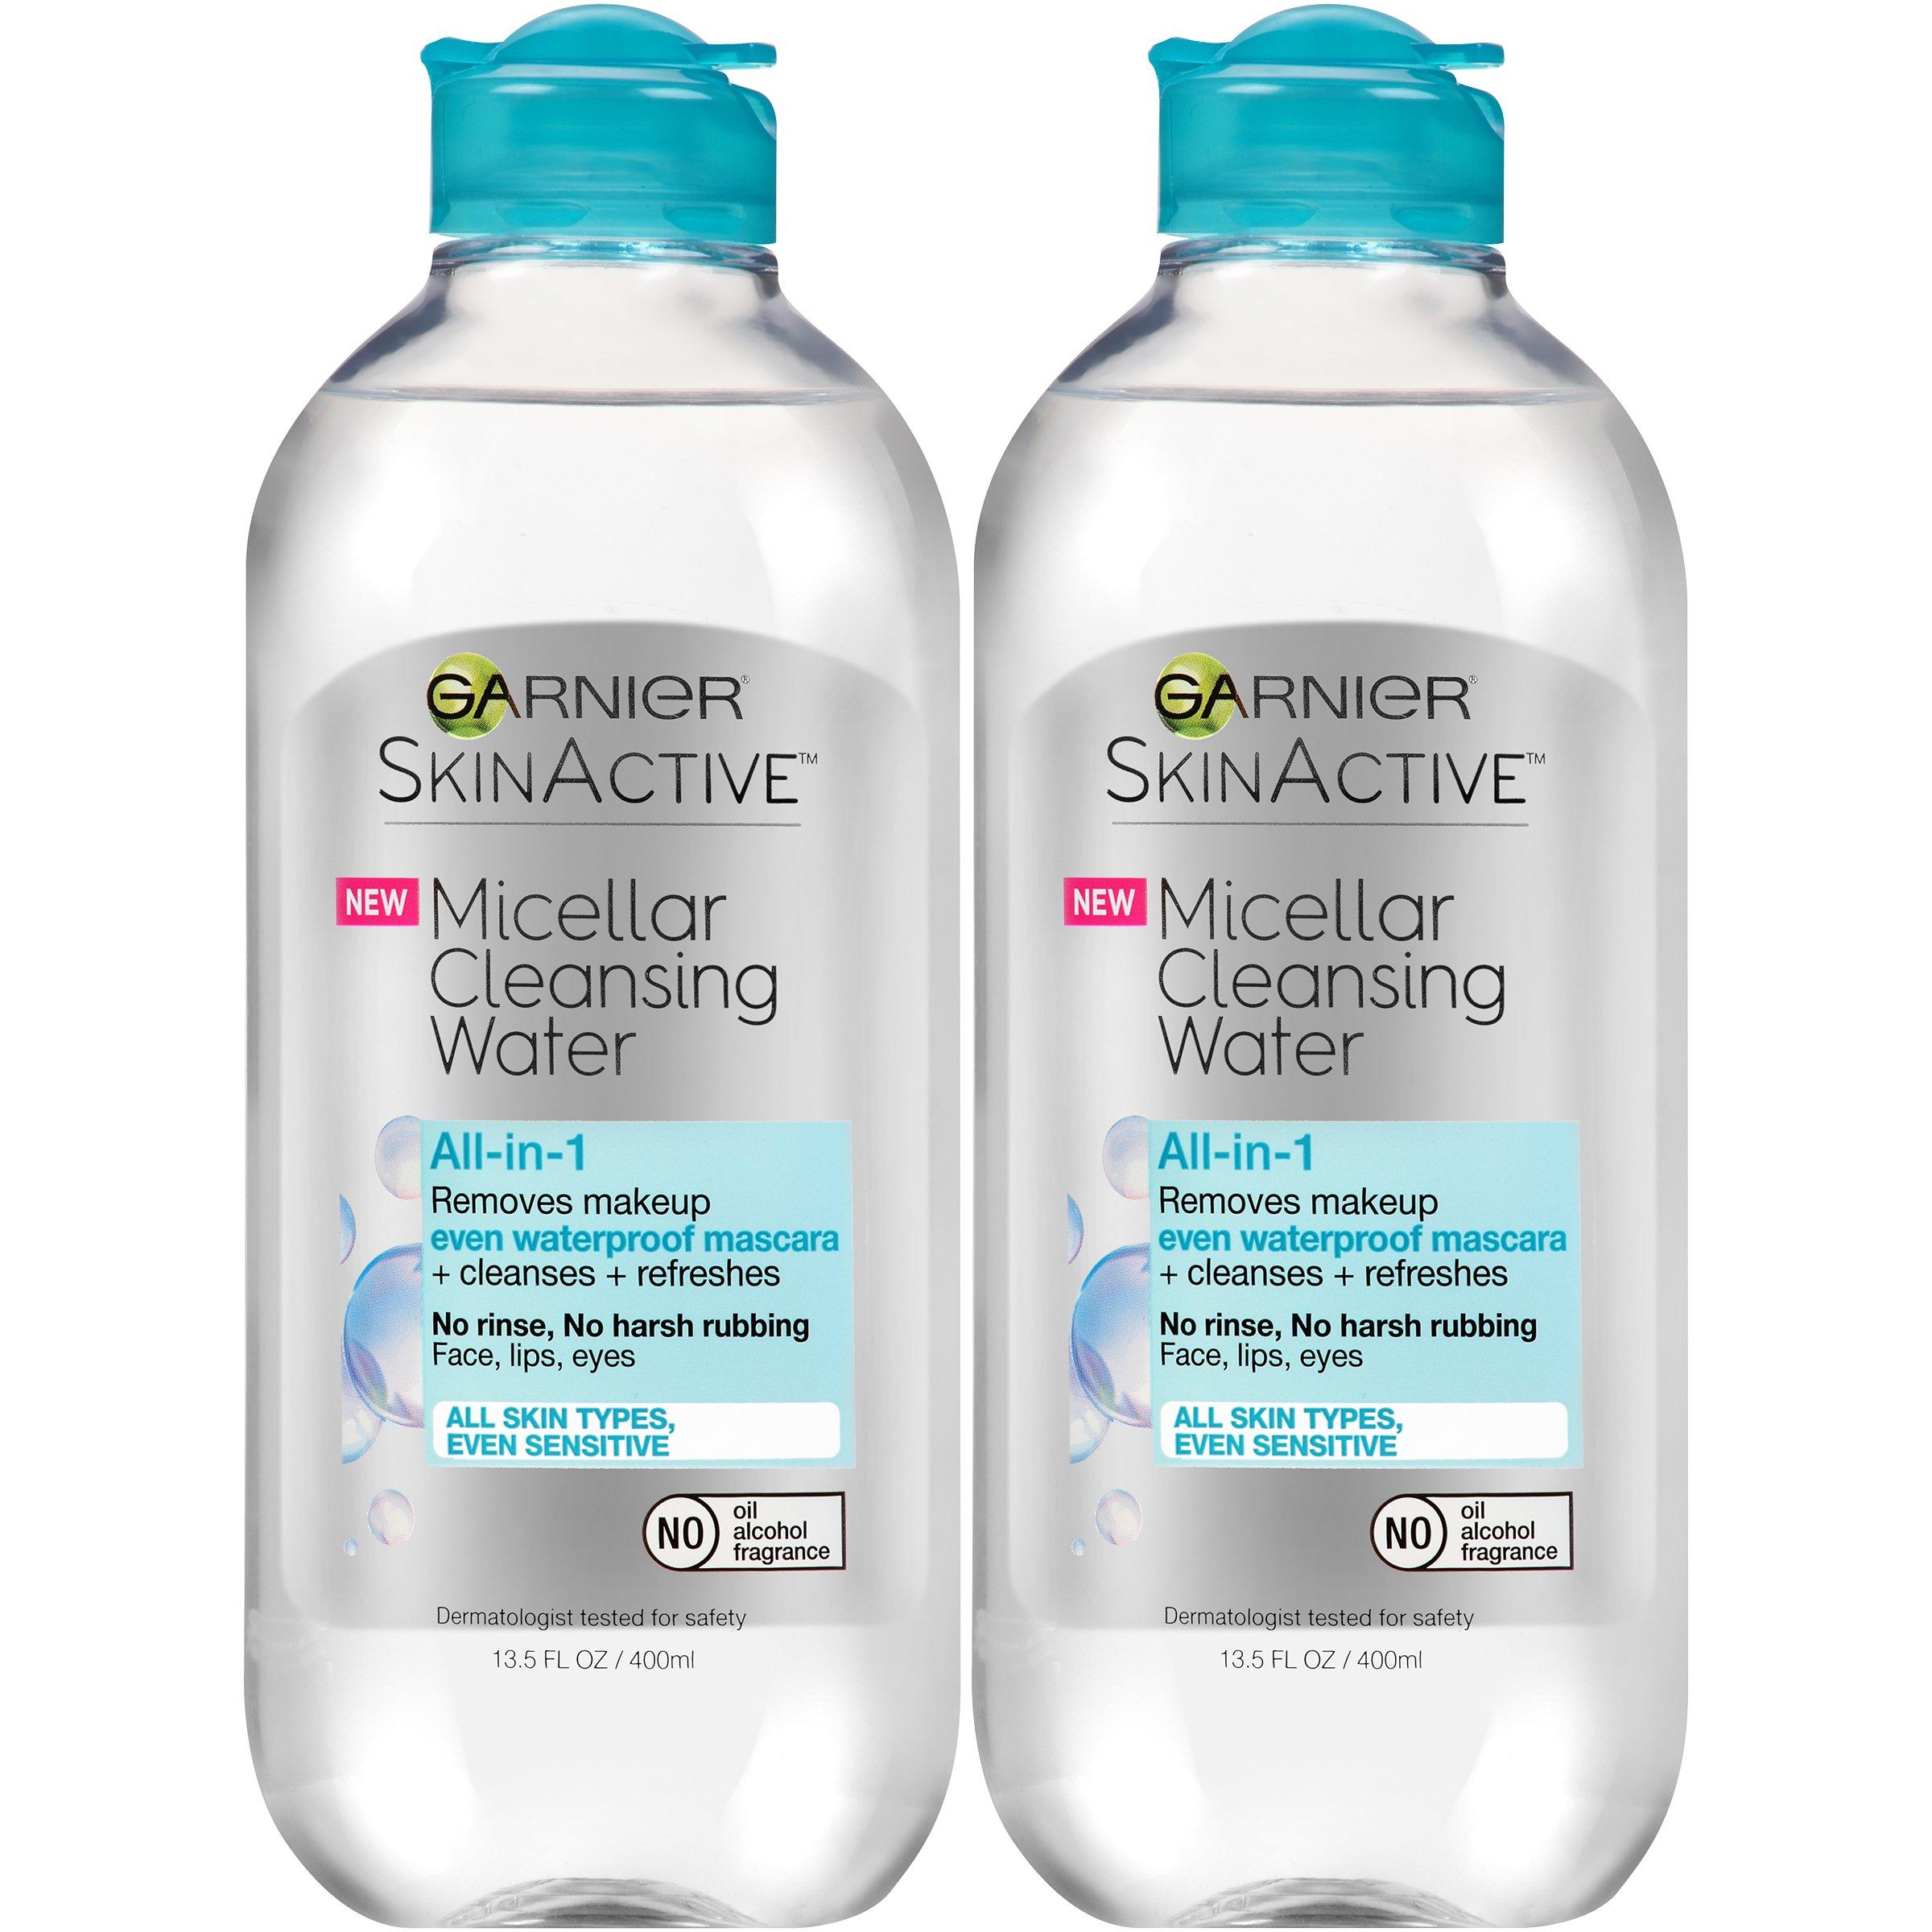 Garnier SkinActive Micellar Cleansing Water, For Waterproof Makeup,  13.5 Fl Oz, 2 Count by Garnier